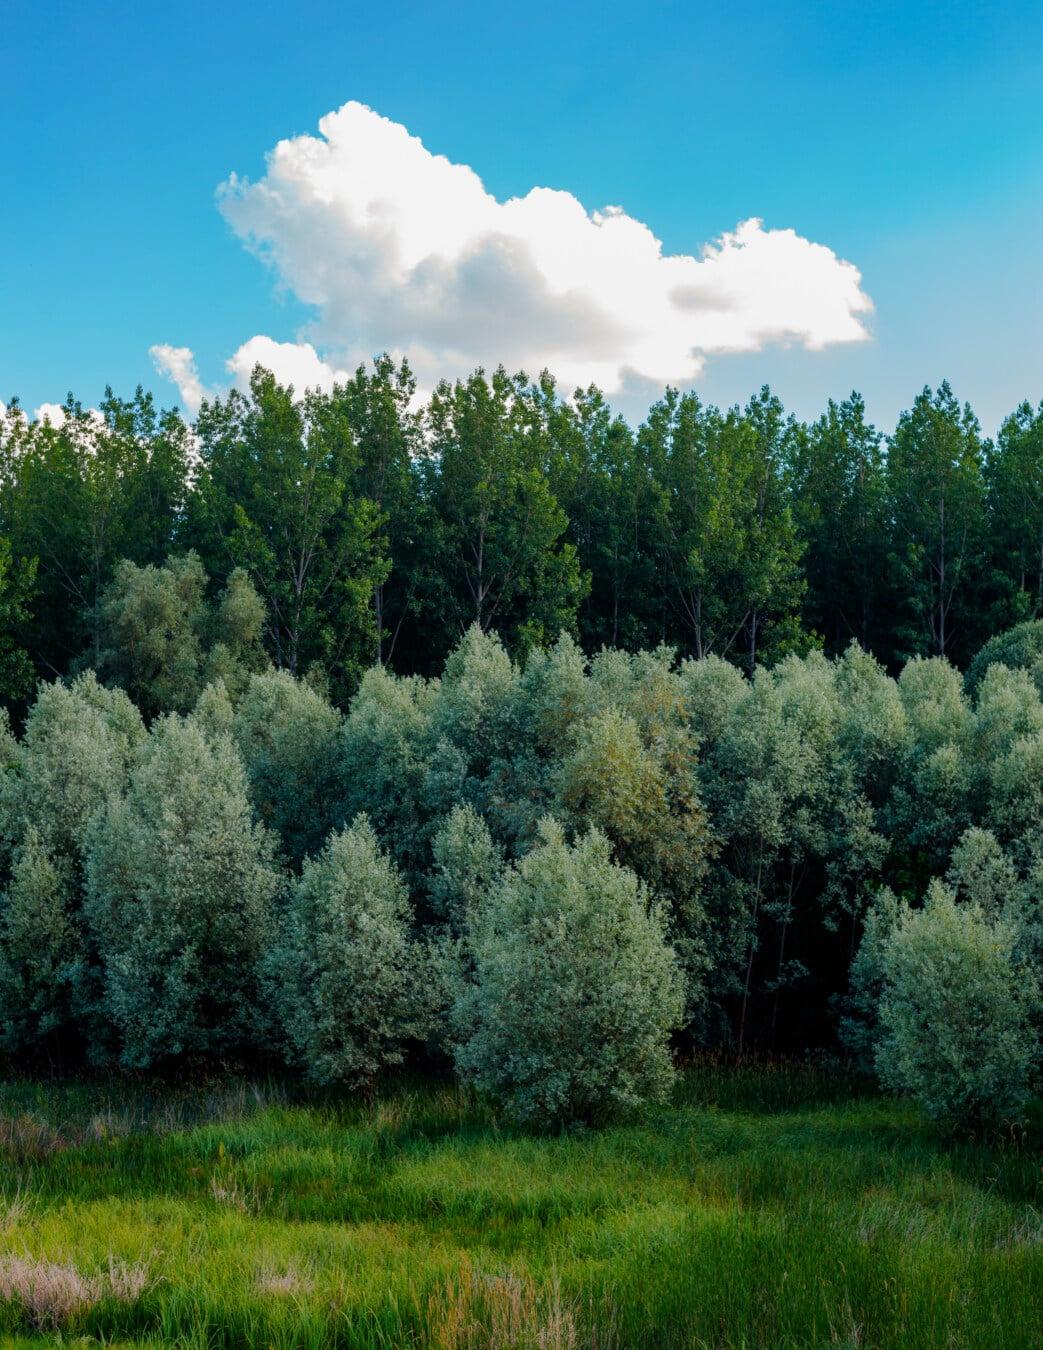 woodland, greenery, shrub, trees, forest, wood, nature, tree, landscape, plant